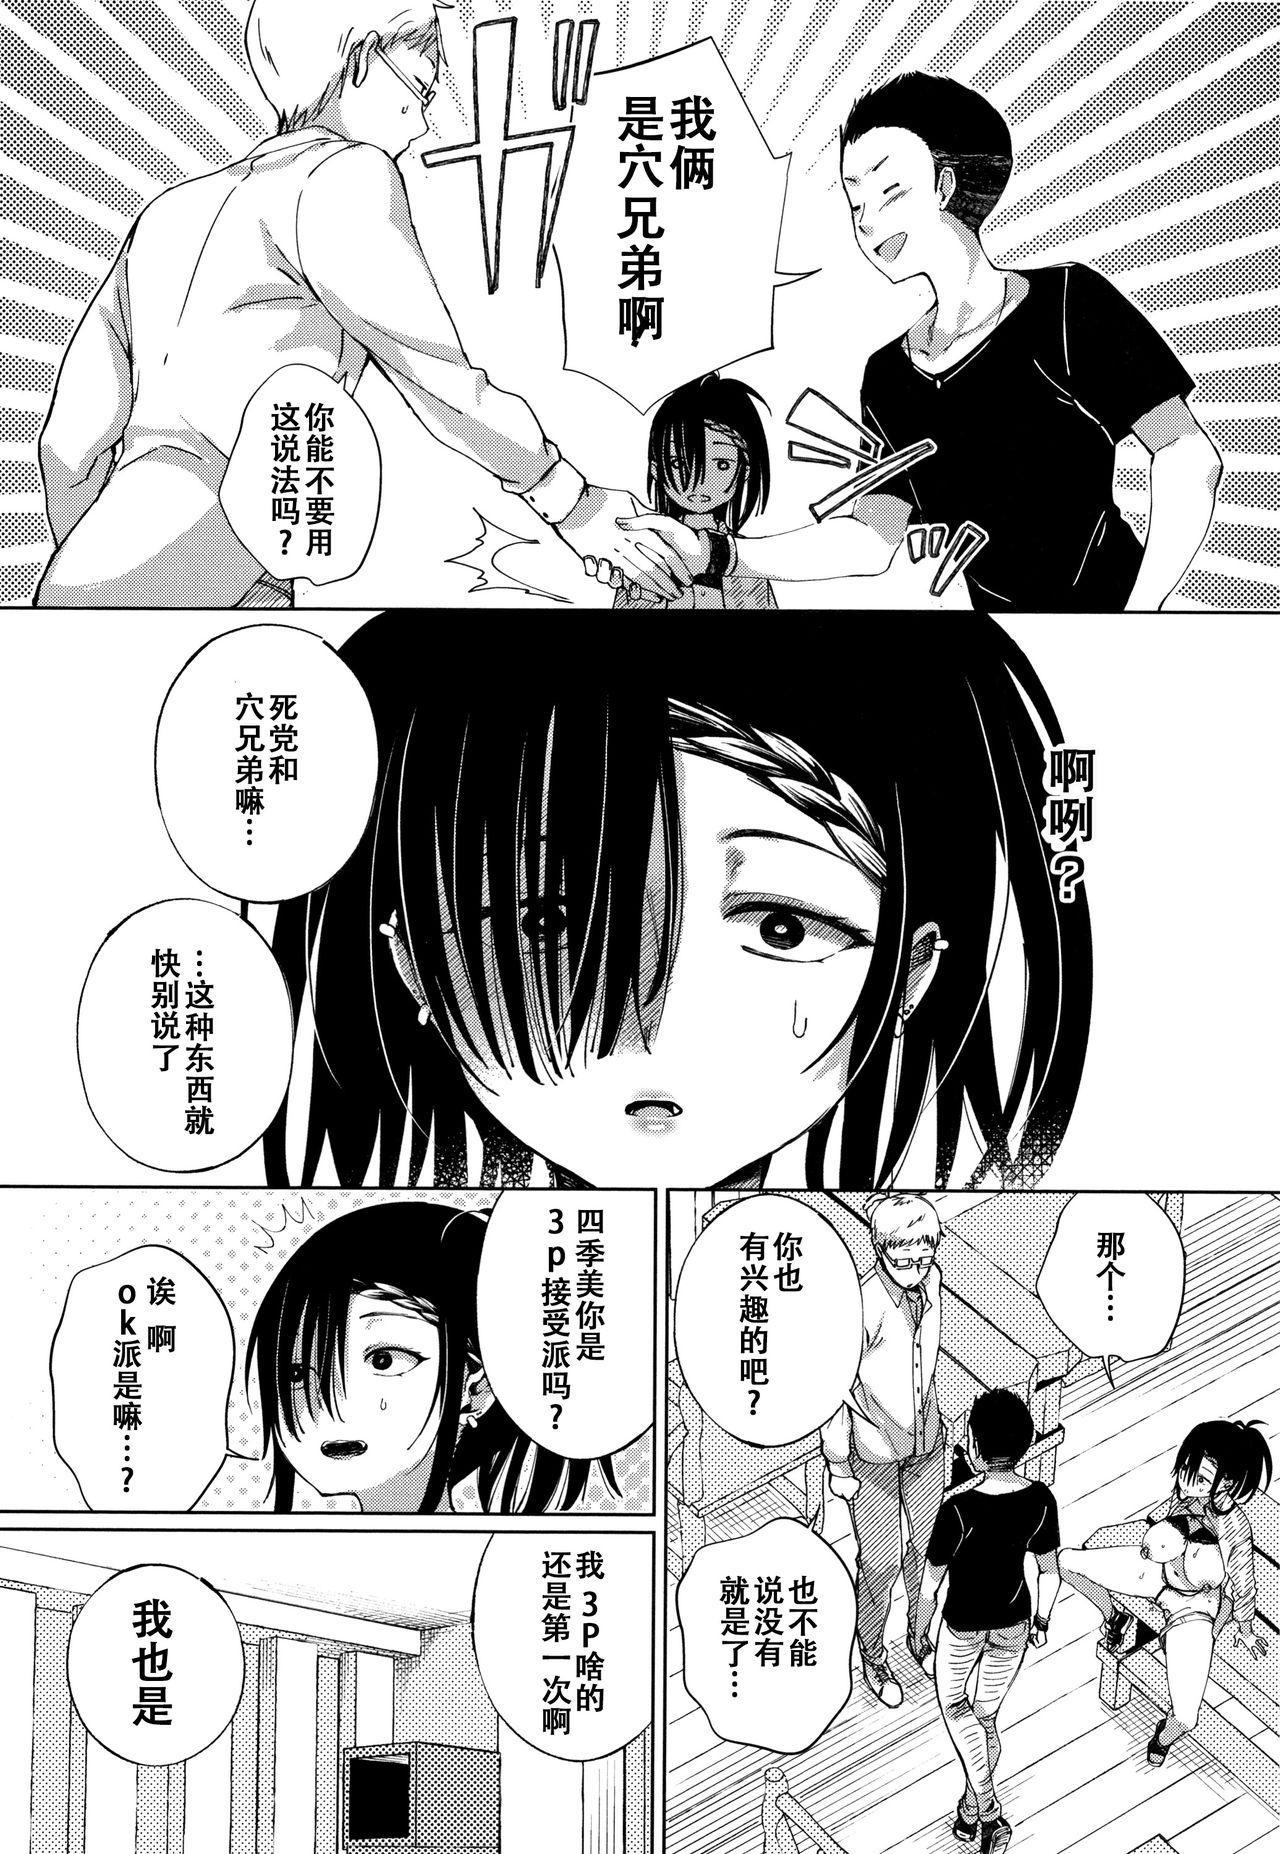 [Achumuchi] Saijaku Gal wa Ikizurai! - The weakest pussy is hard to go.ch.1-3 [Chinese] [战栗的玻璃棒汉化] [Ongoing] 32